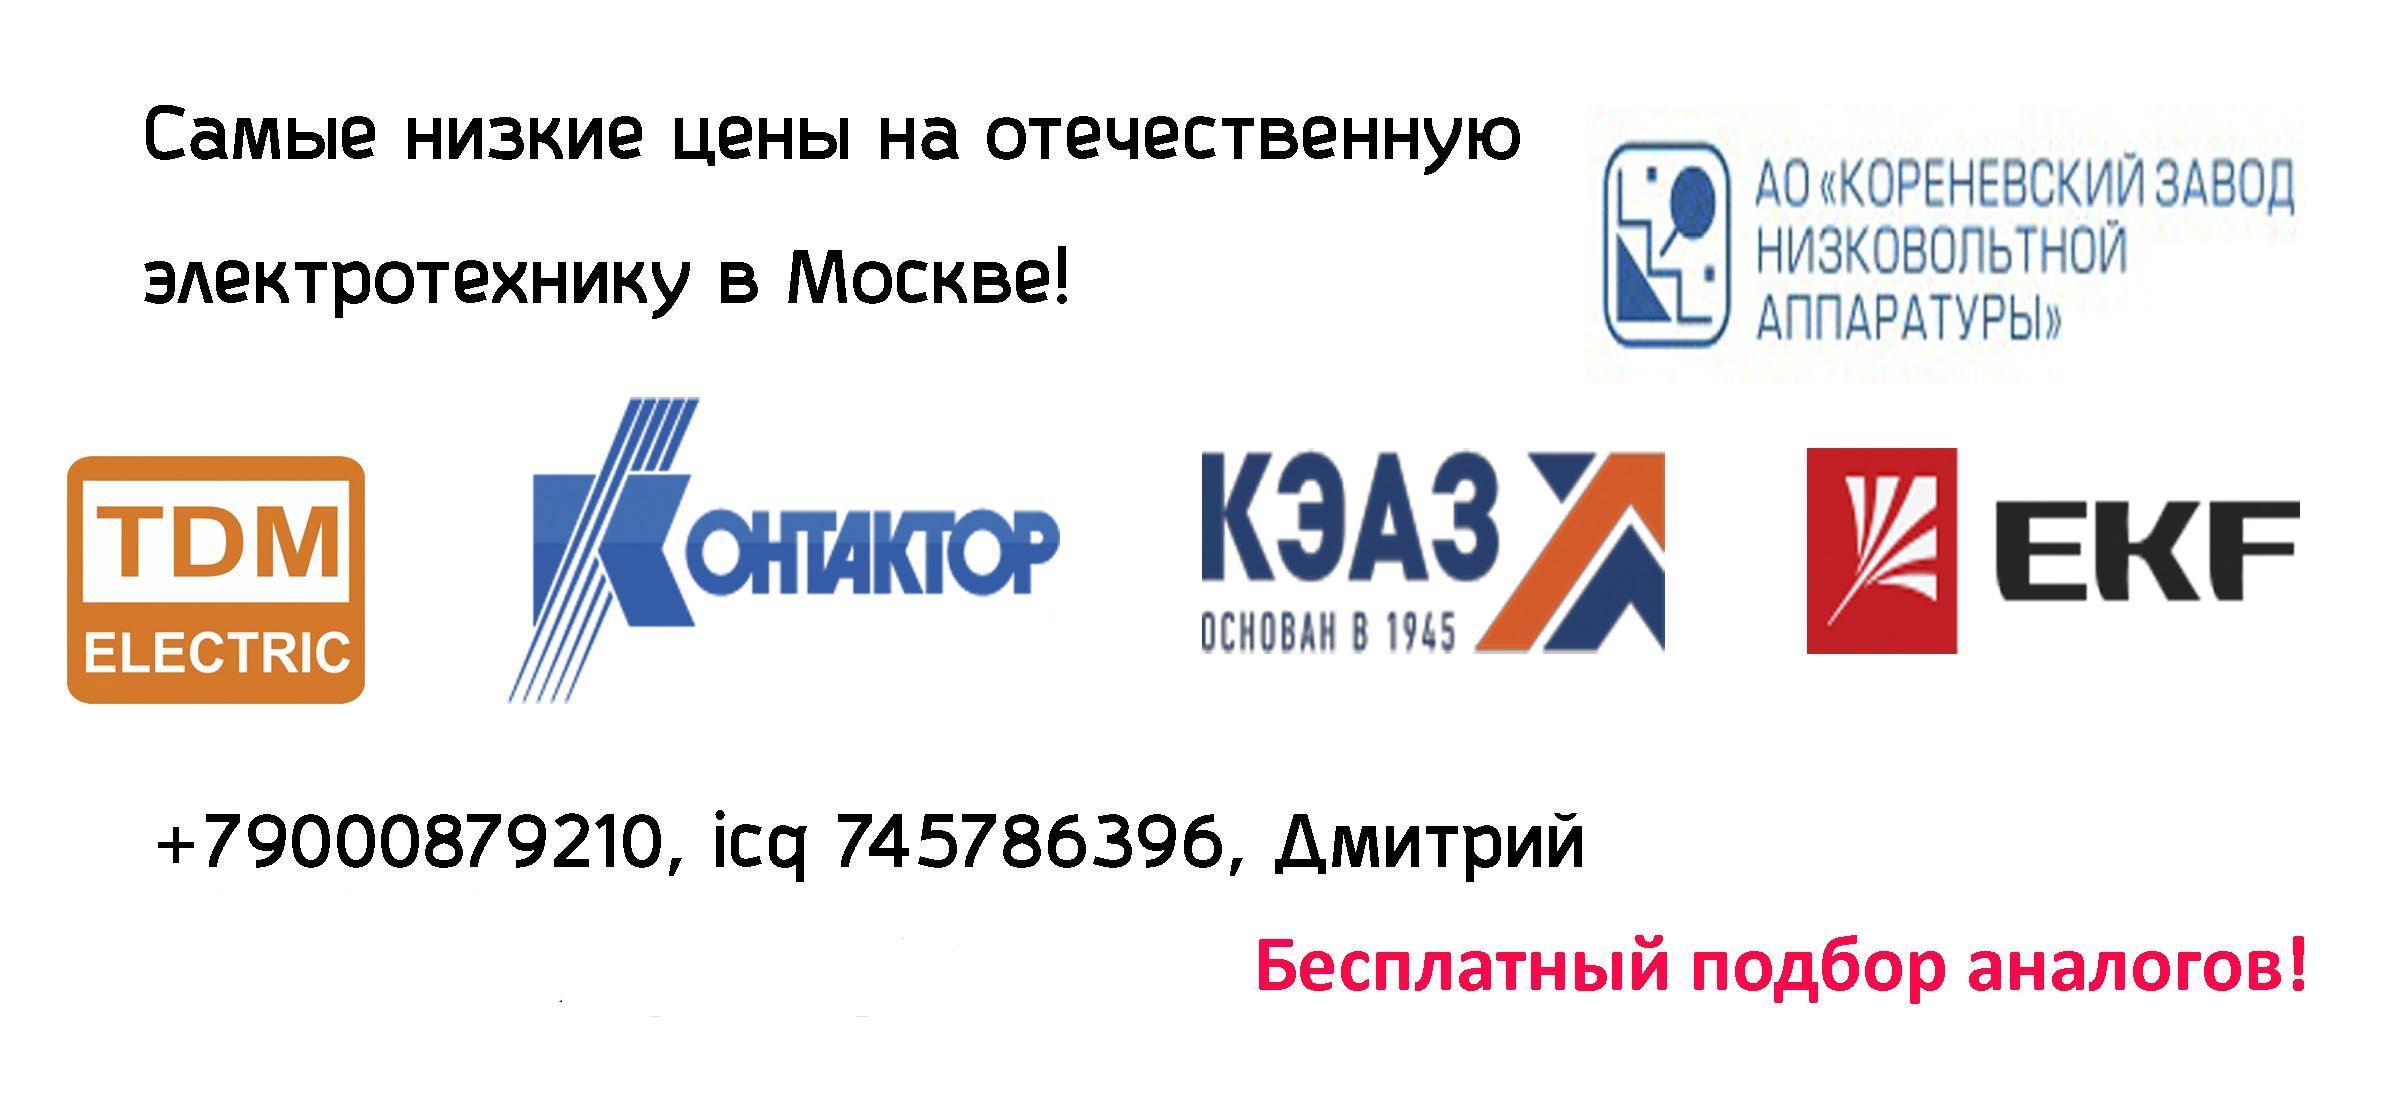 vizitka tdm-elektrik.ru